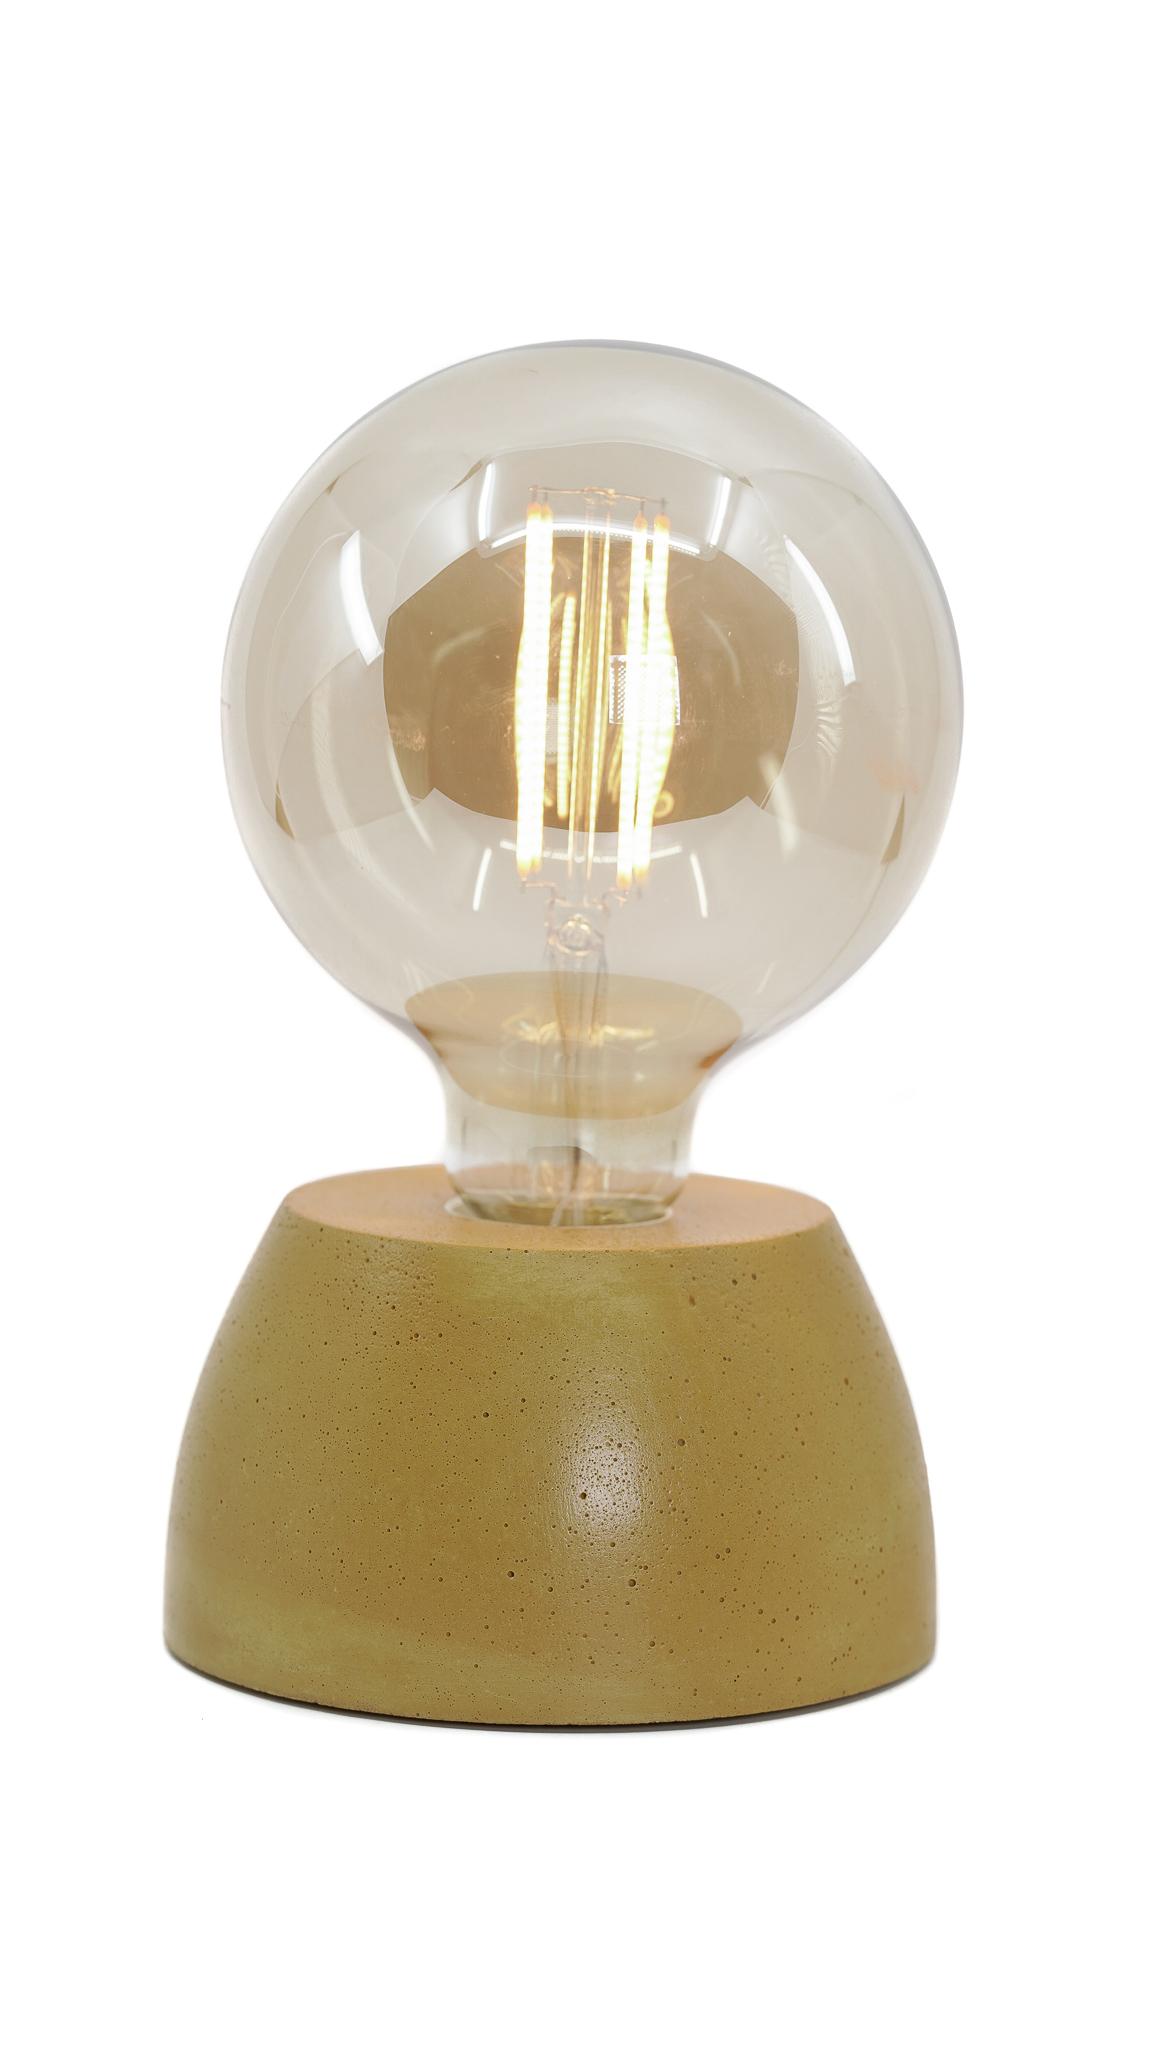 Lampe dôme en béton jaune moutarde fabrication artisanale